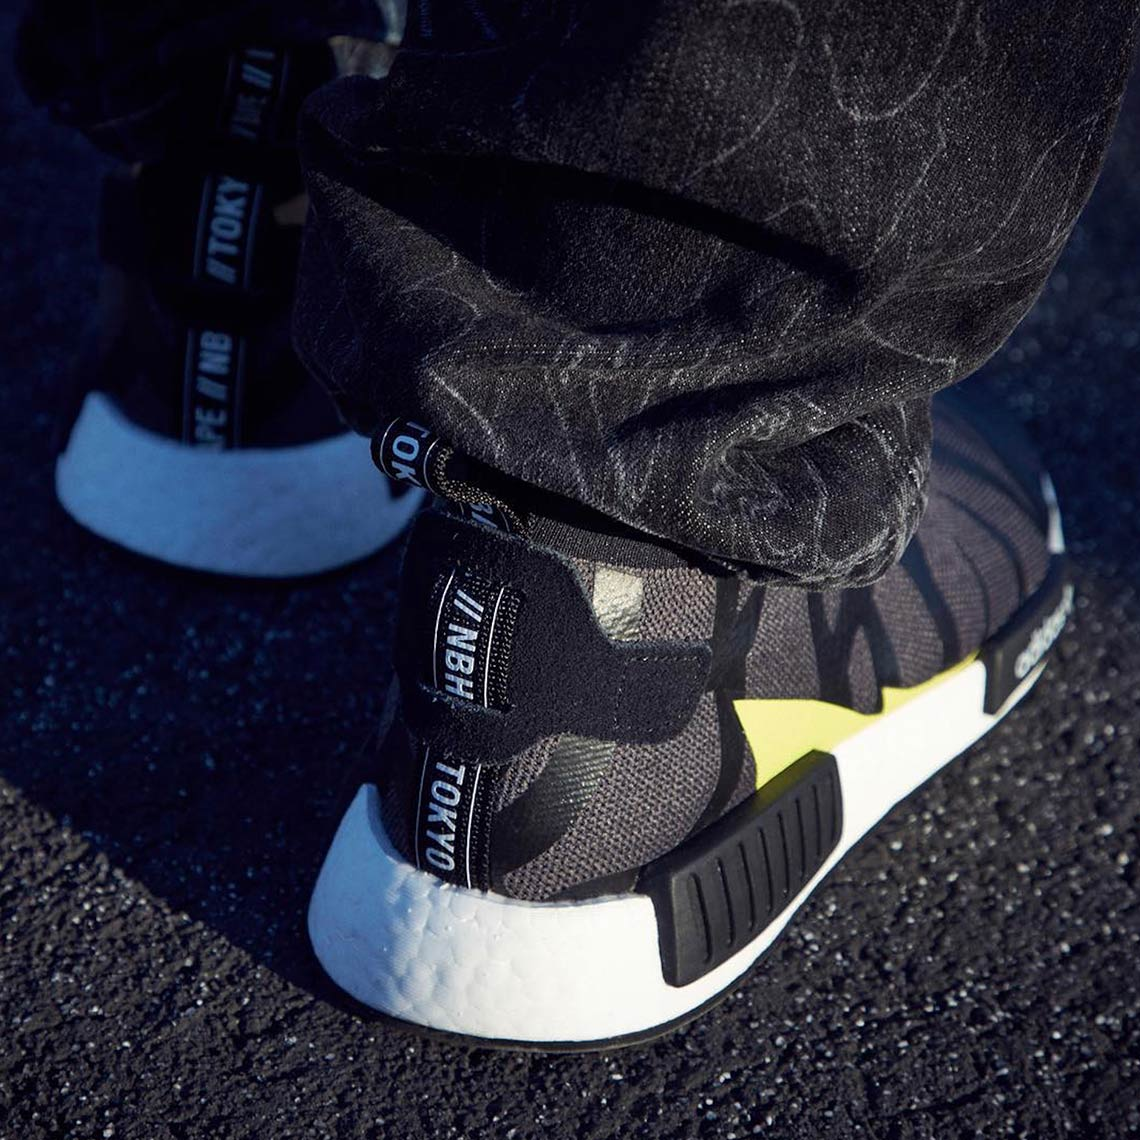 adidas x bape x neighborhood nmd